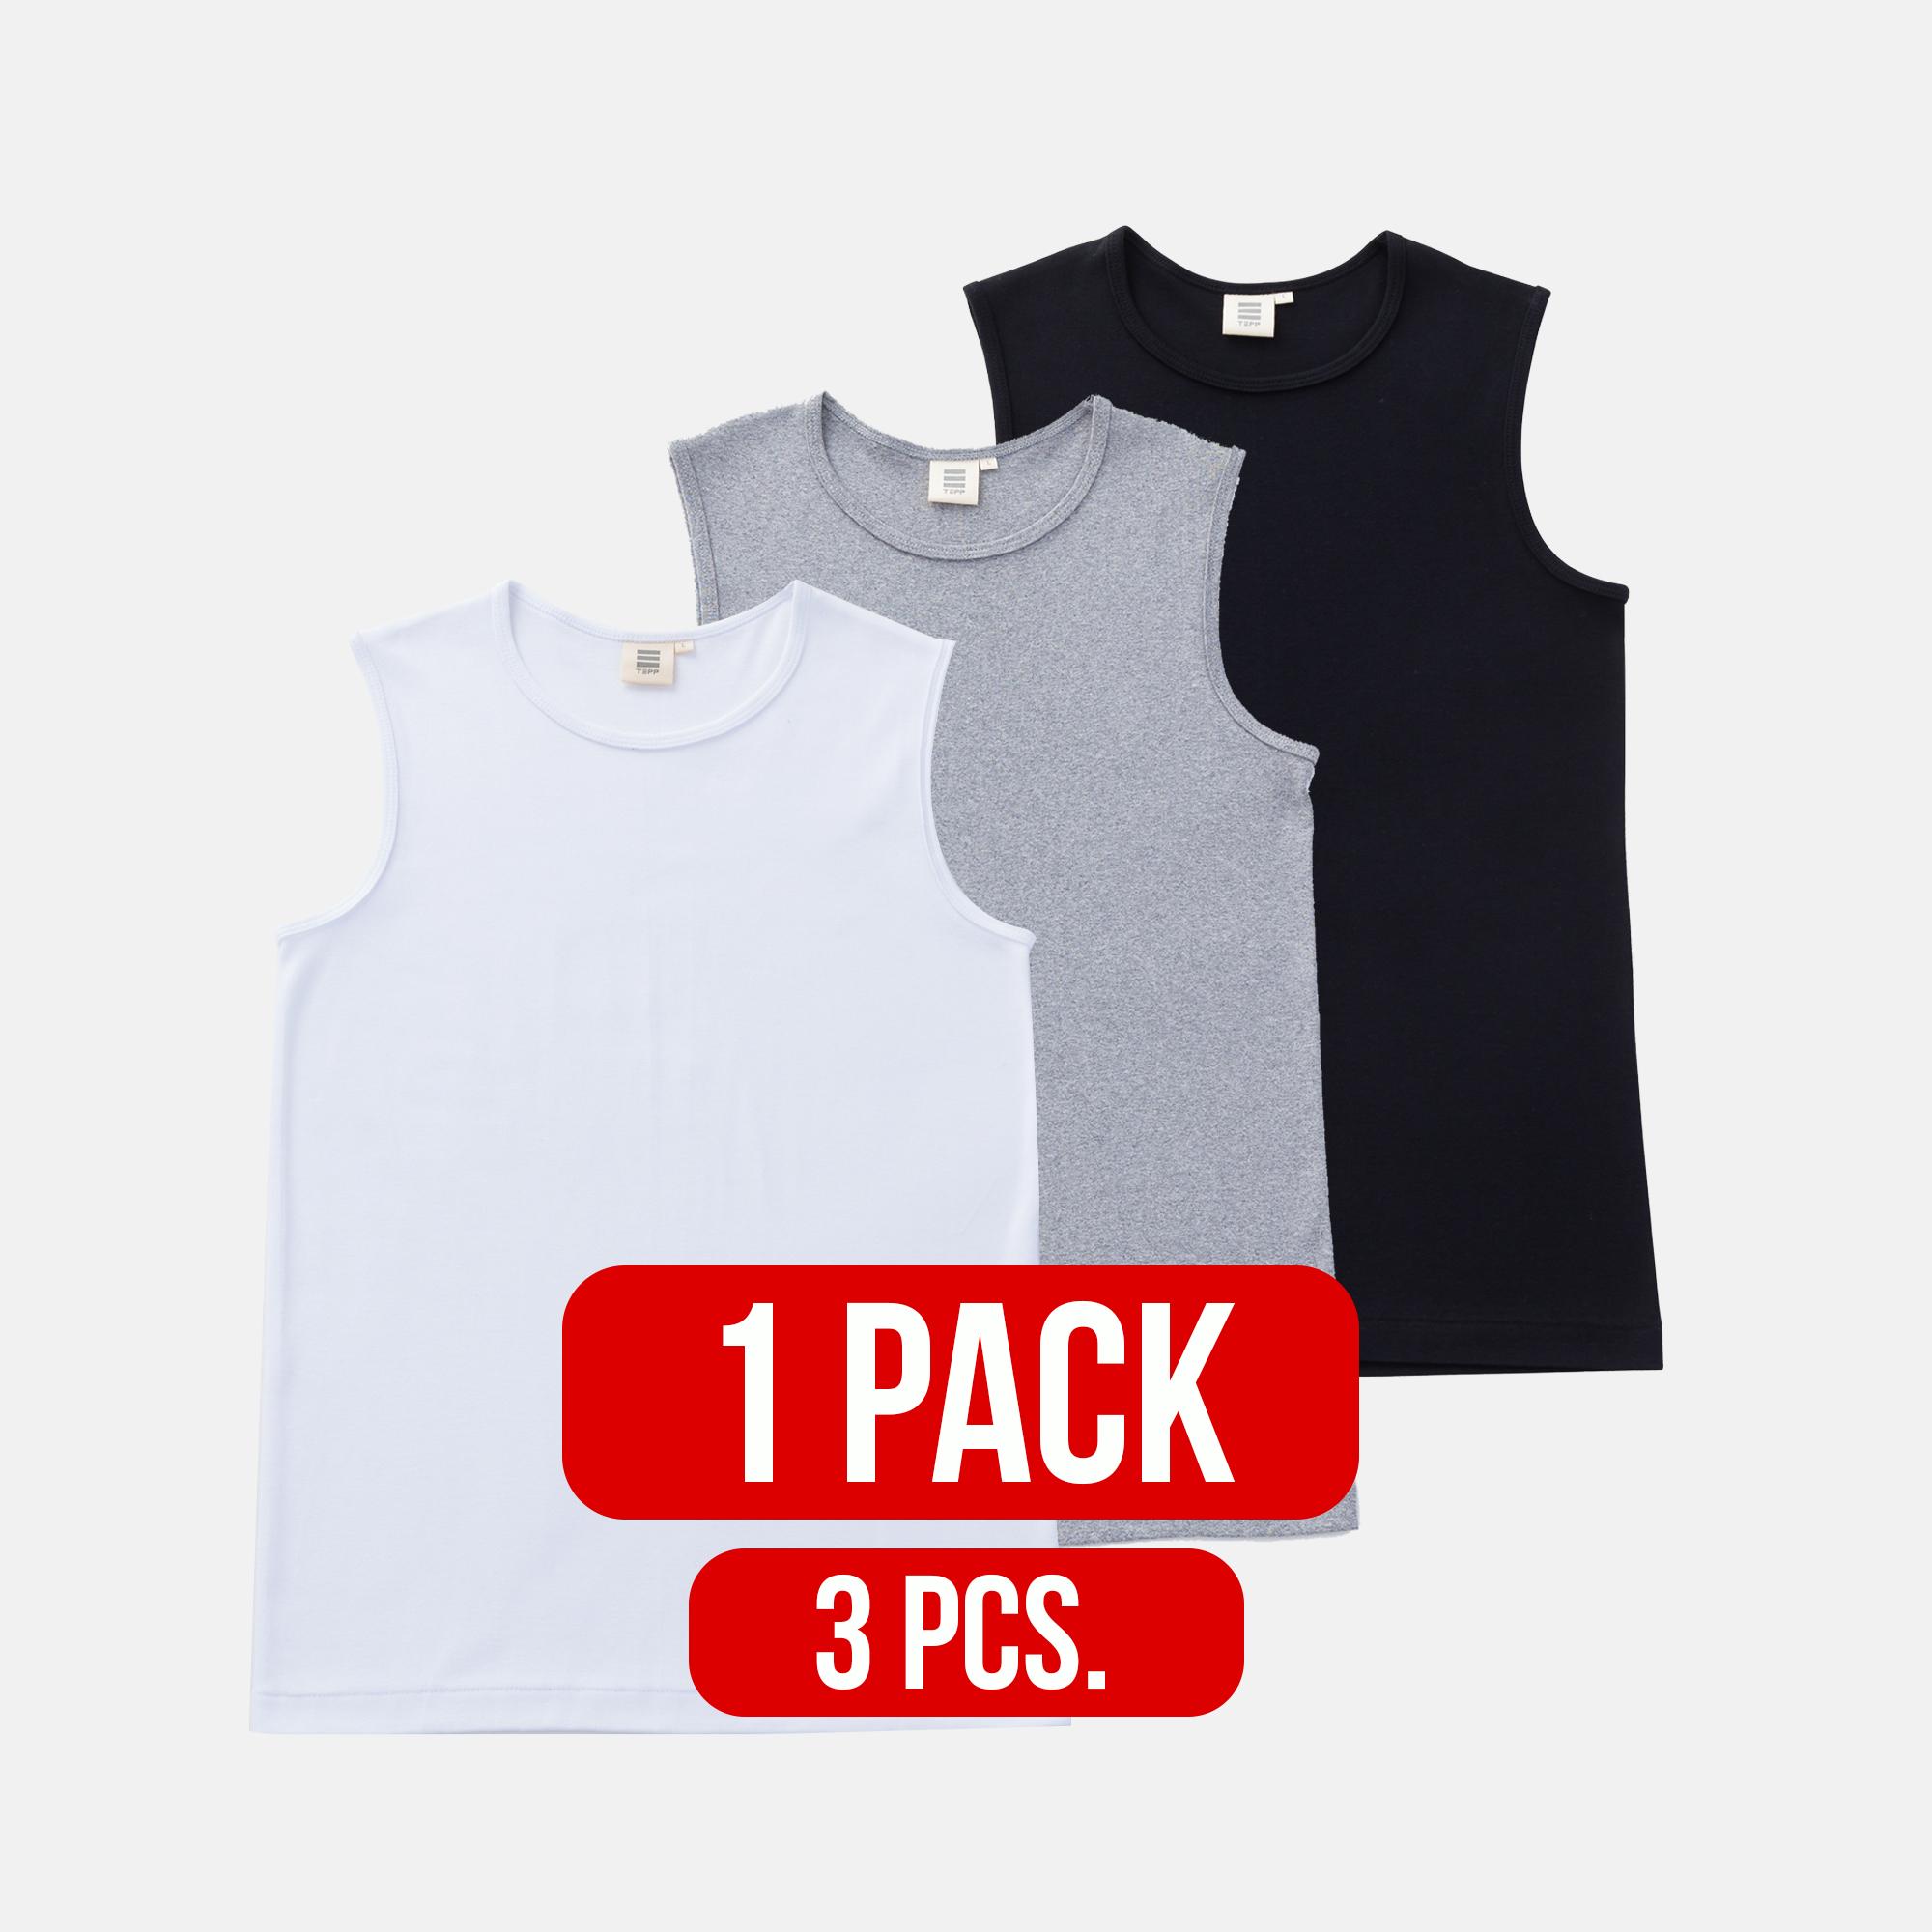 Round neck sleeveless shirt MIX (1Pack)(3PCS.)